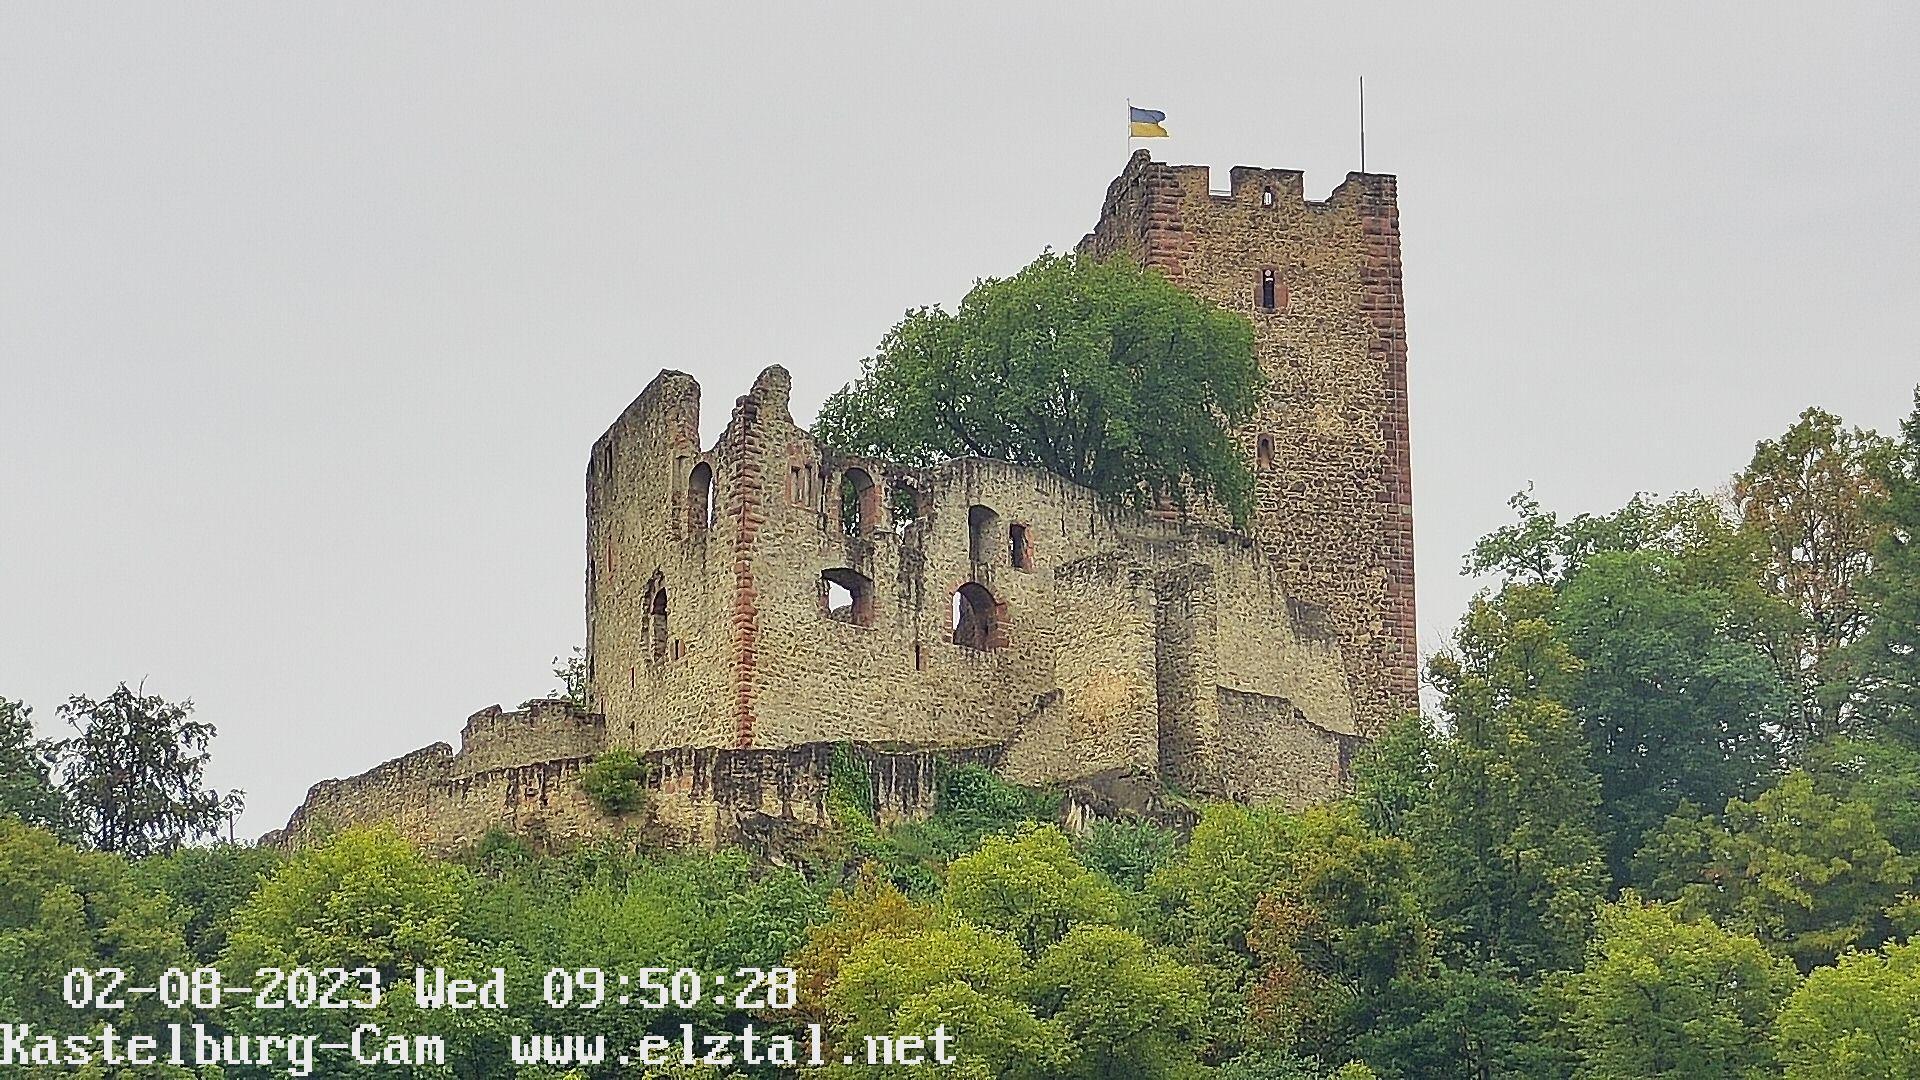 Waldkirch Wed. 09:55